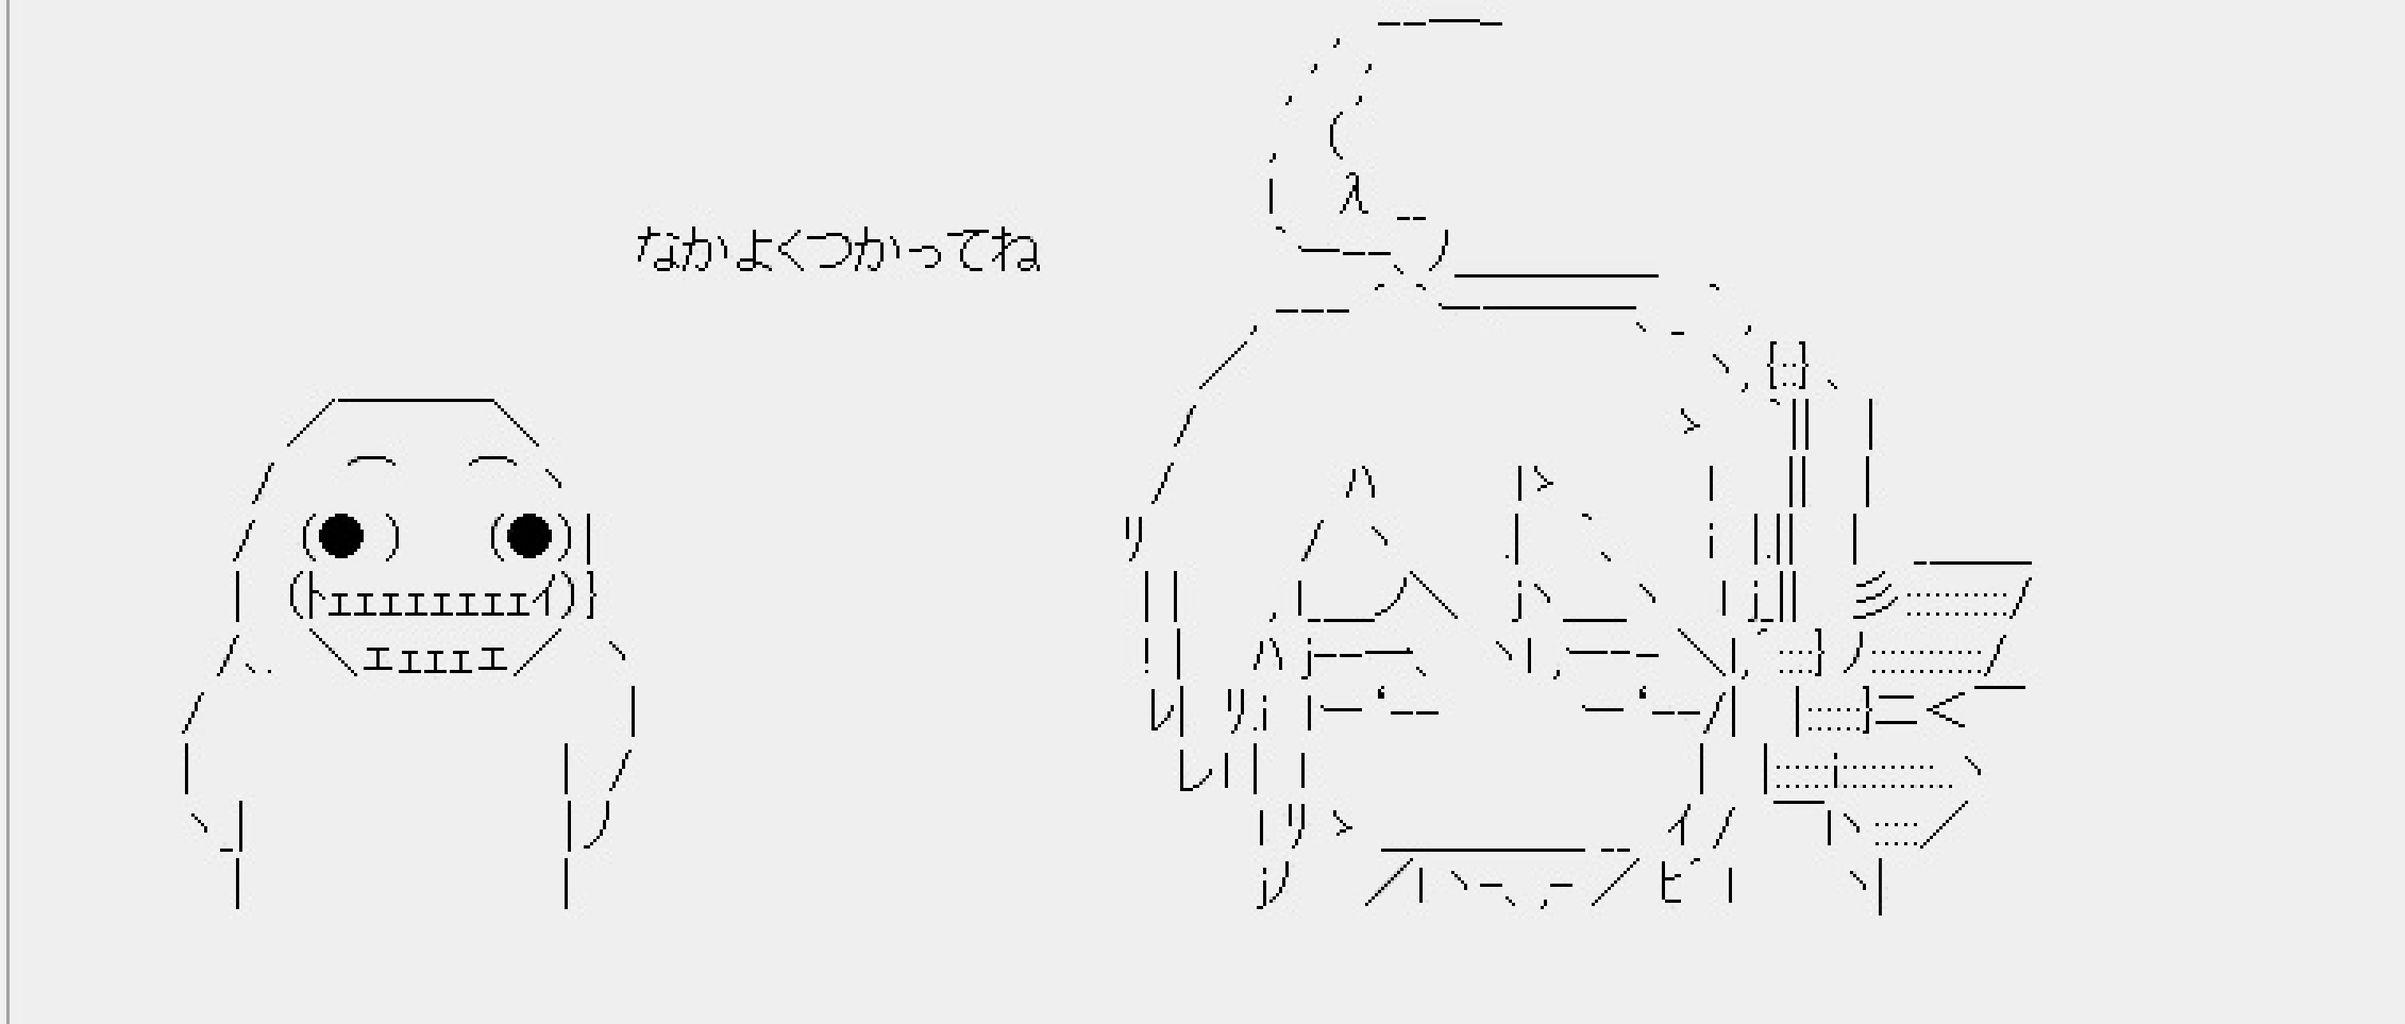 b9778917 - コピー